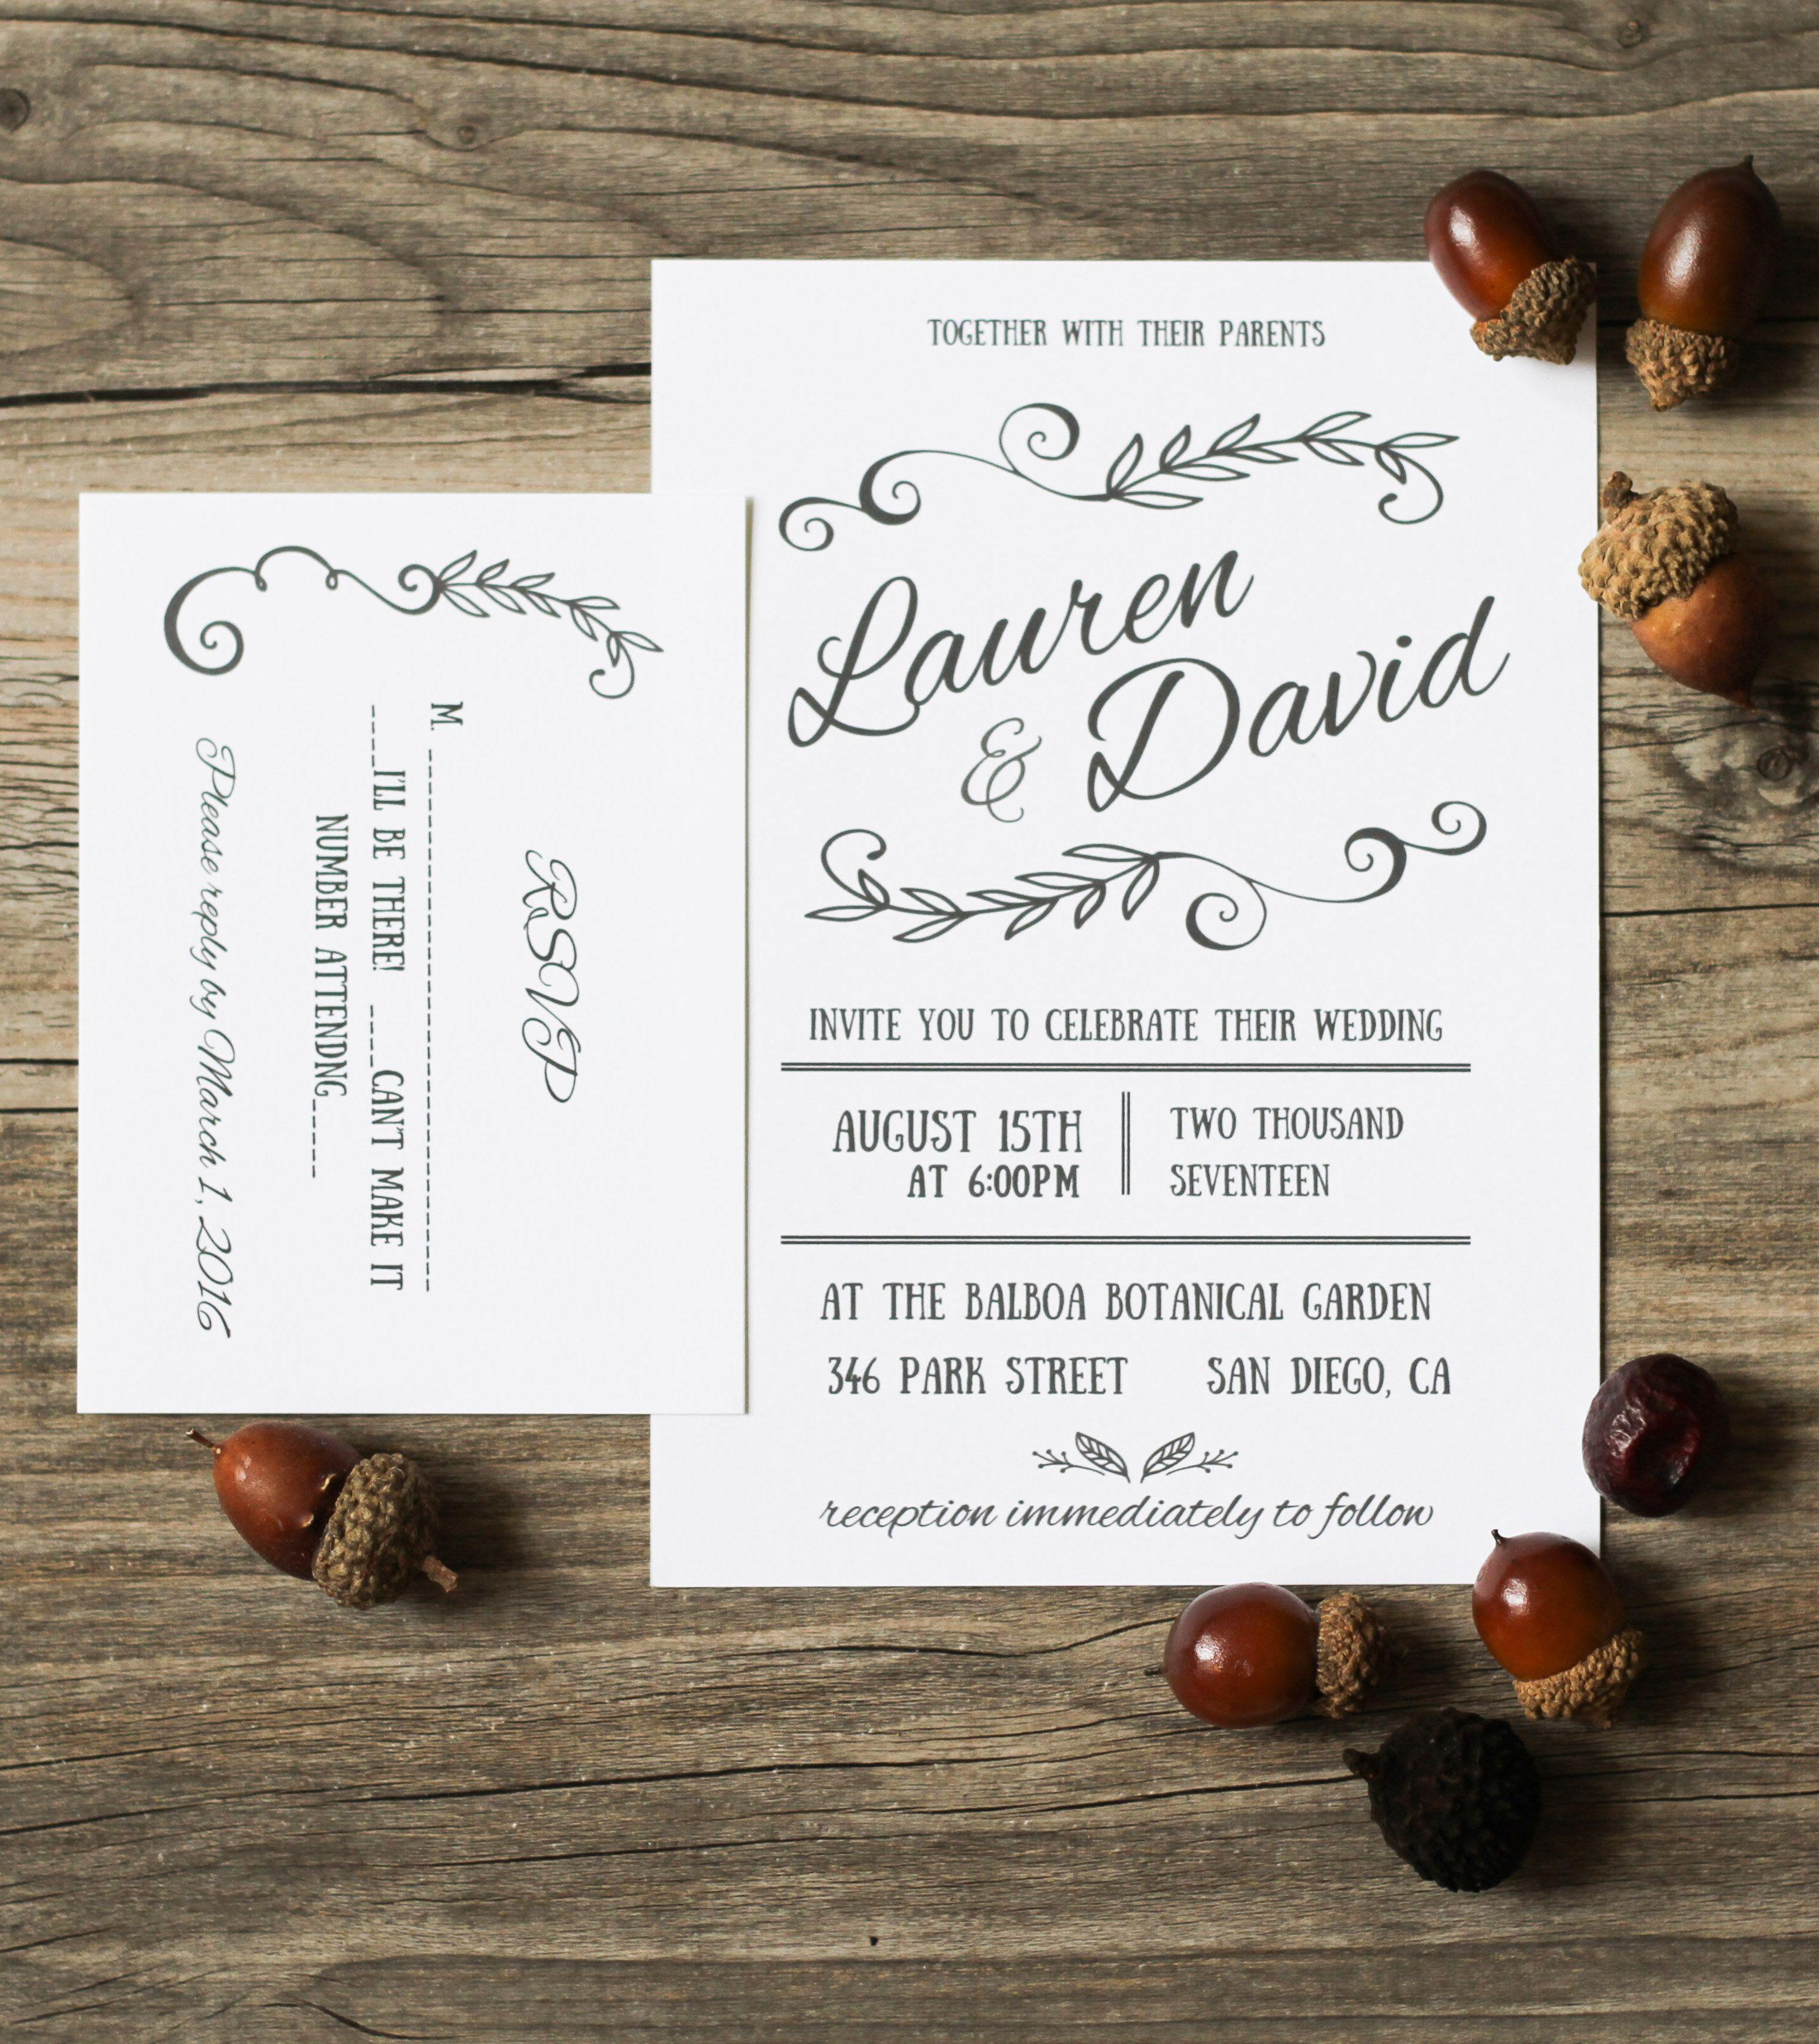 001 Amazing Microsoft Word Wedding Invitation Template Sample  Templates M Editable Free Download ChineseFull